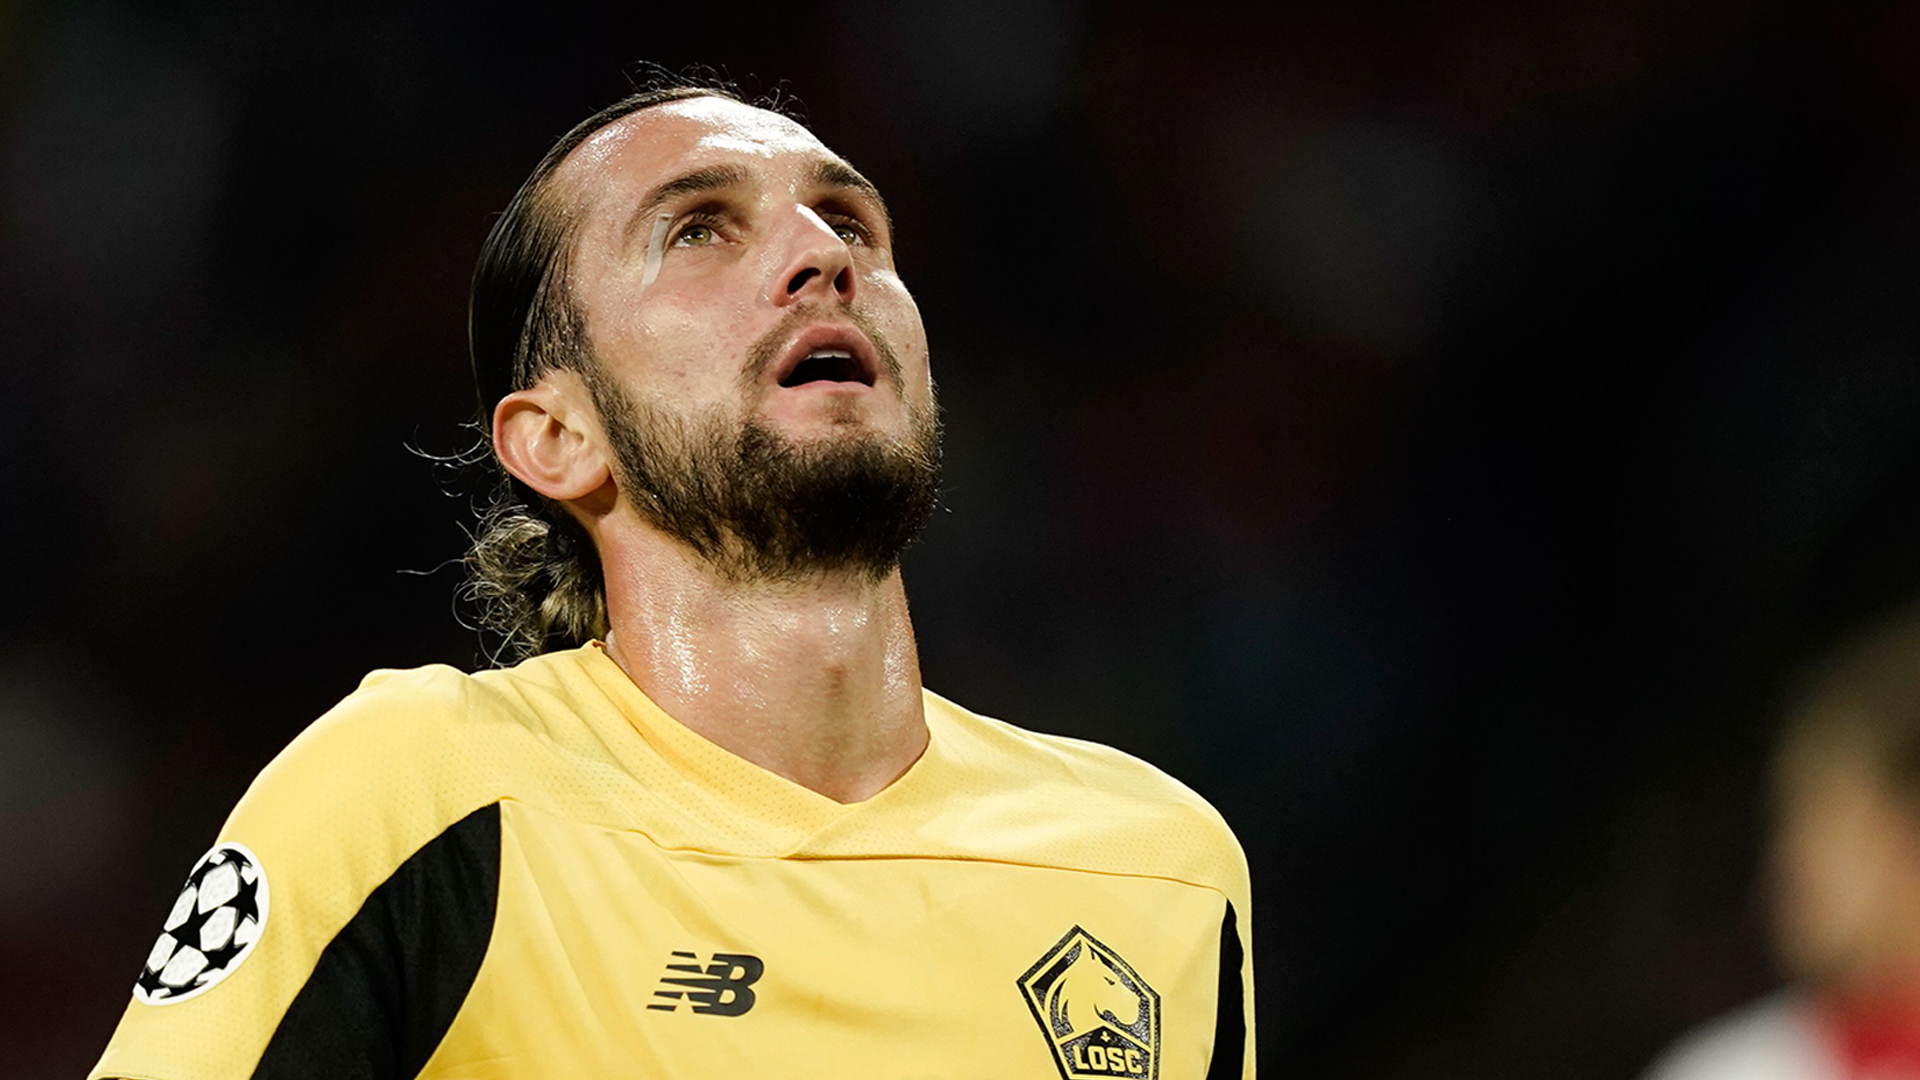 Yazici Yusuf Lille Champions League 2019-20